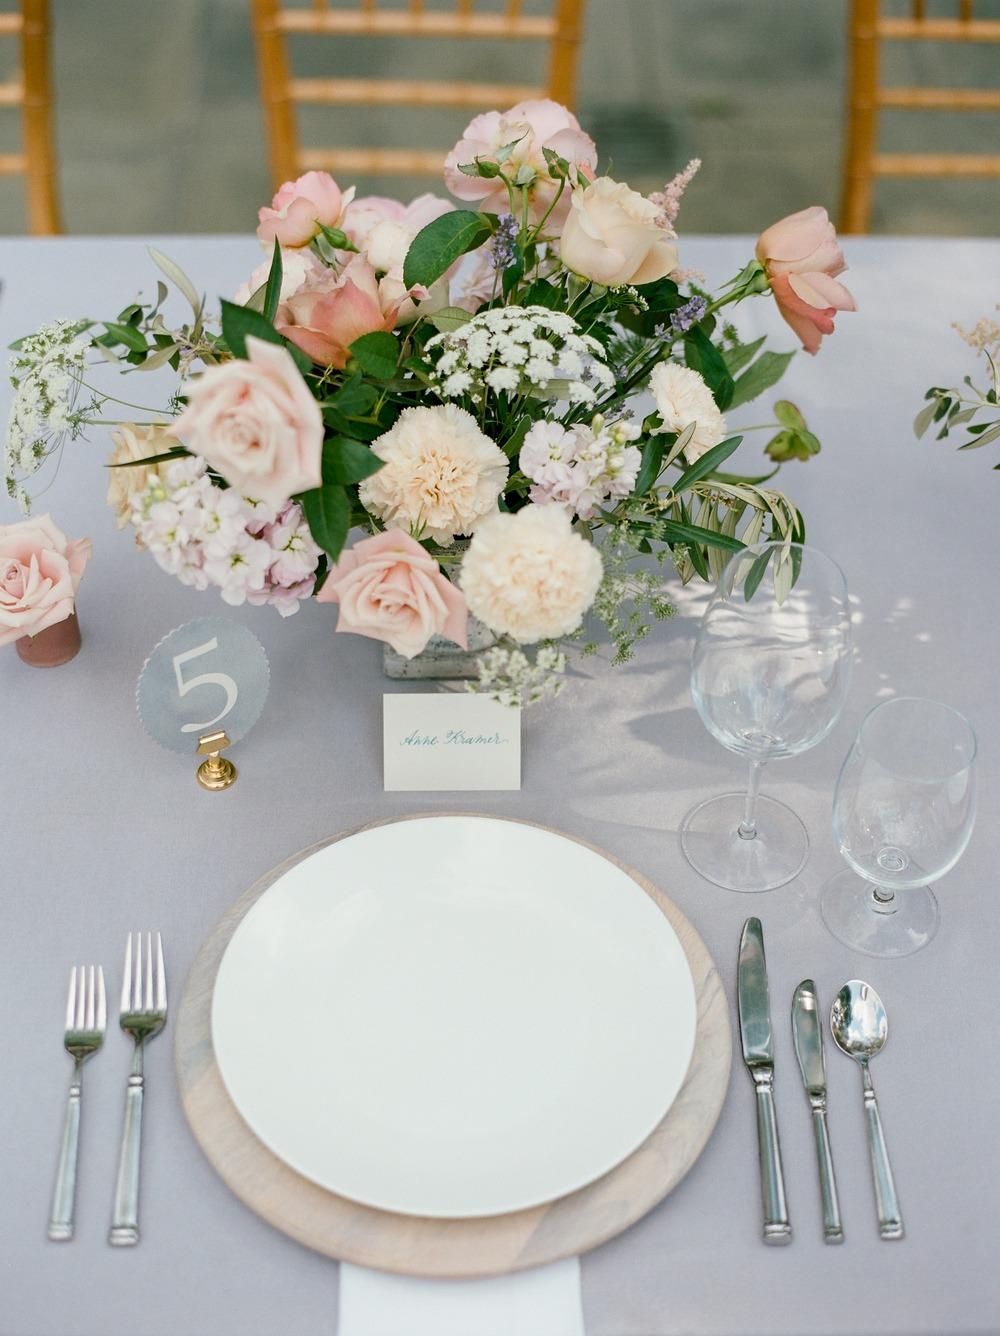 175 Wedding Guests 60k Budget 09